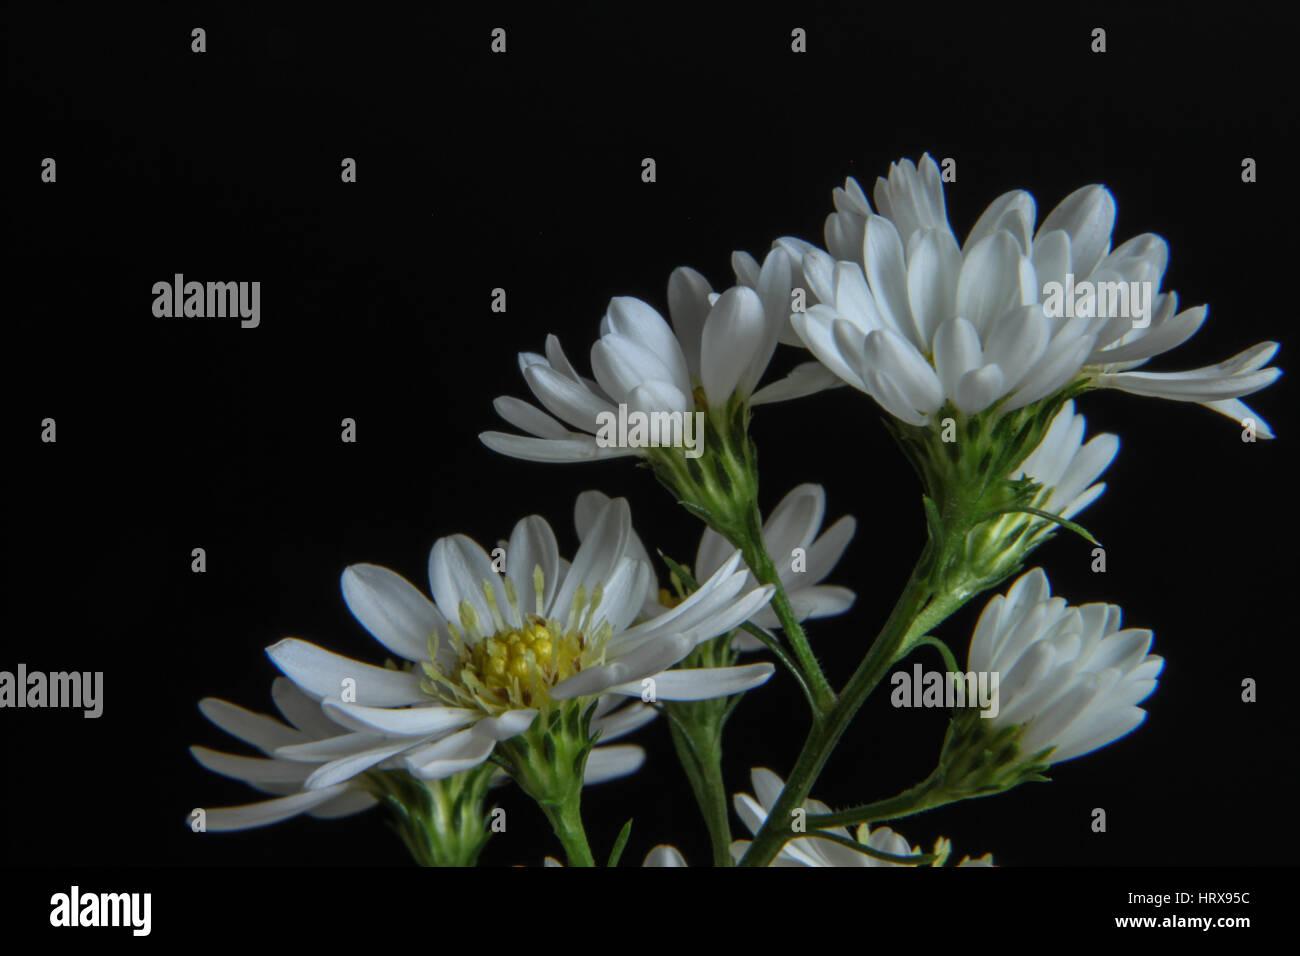 Simple is the best - Chrysanthemum japonense on black background also known as ashizuri noji-giku Ashizuri - Stock Image